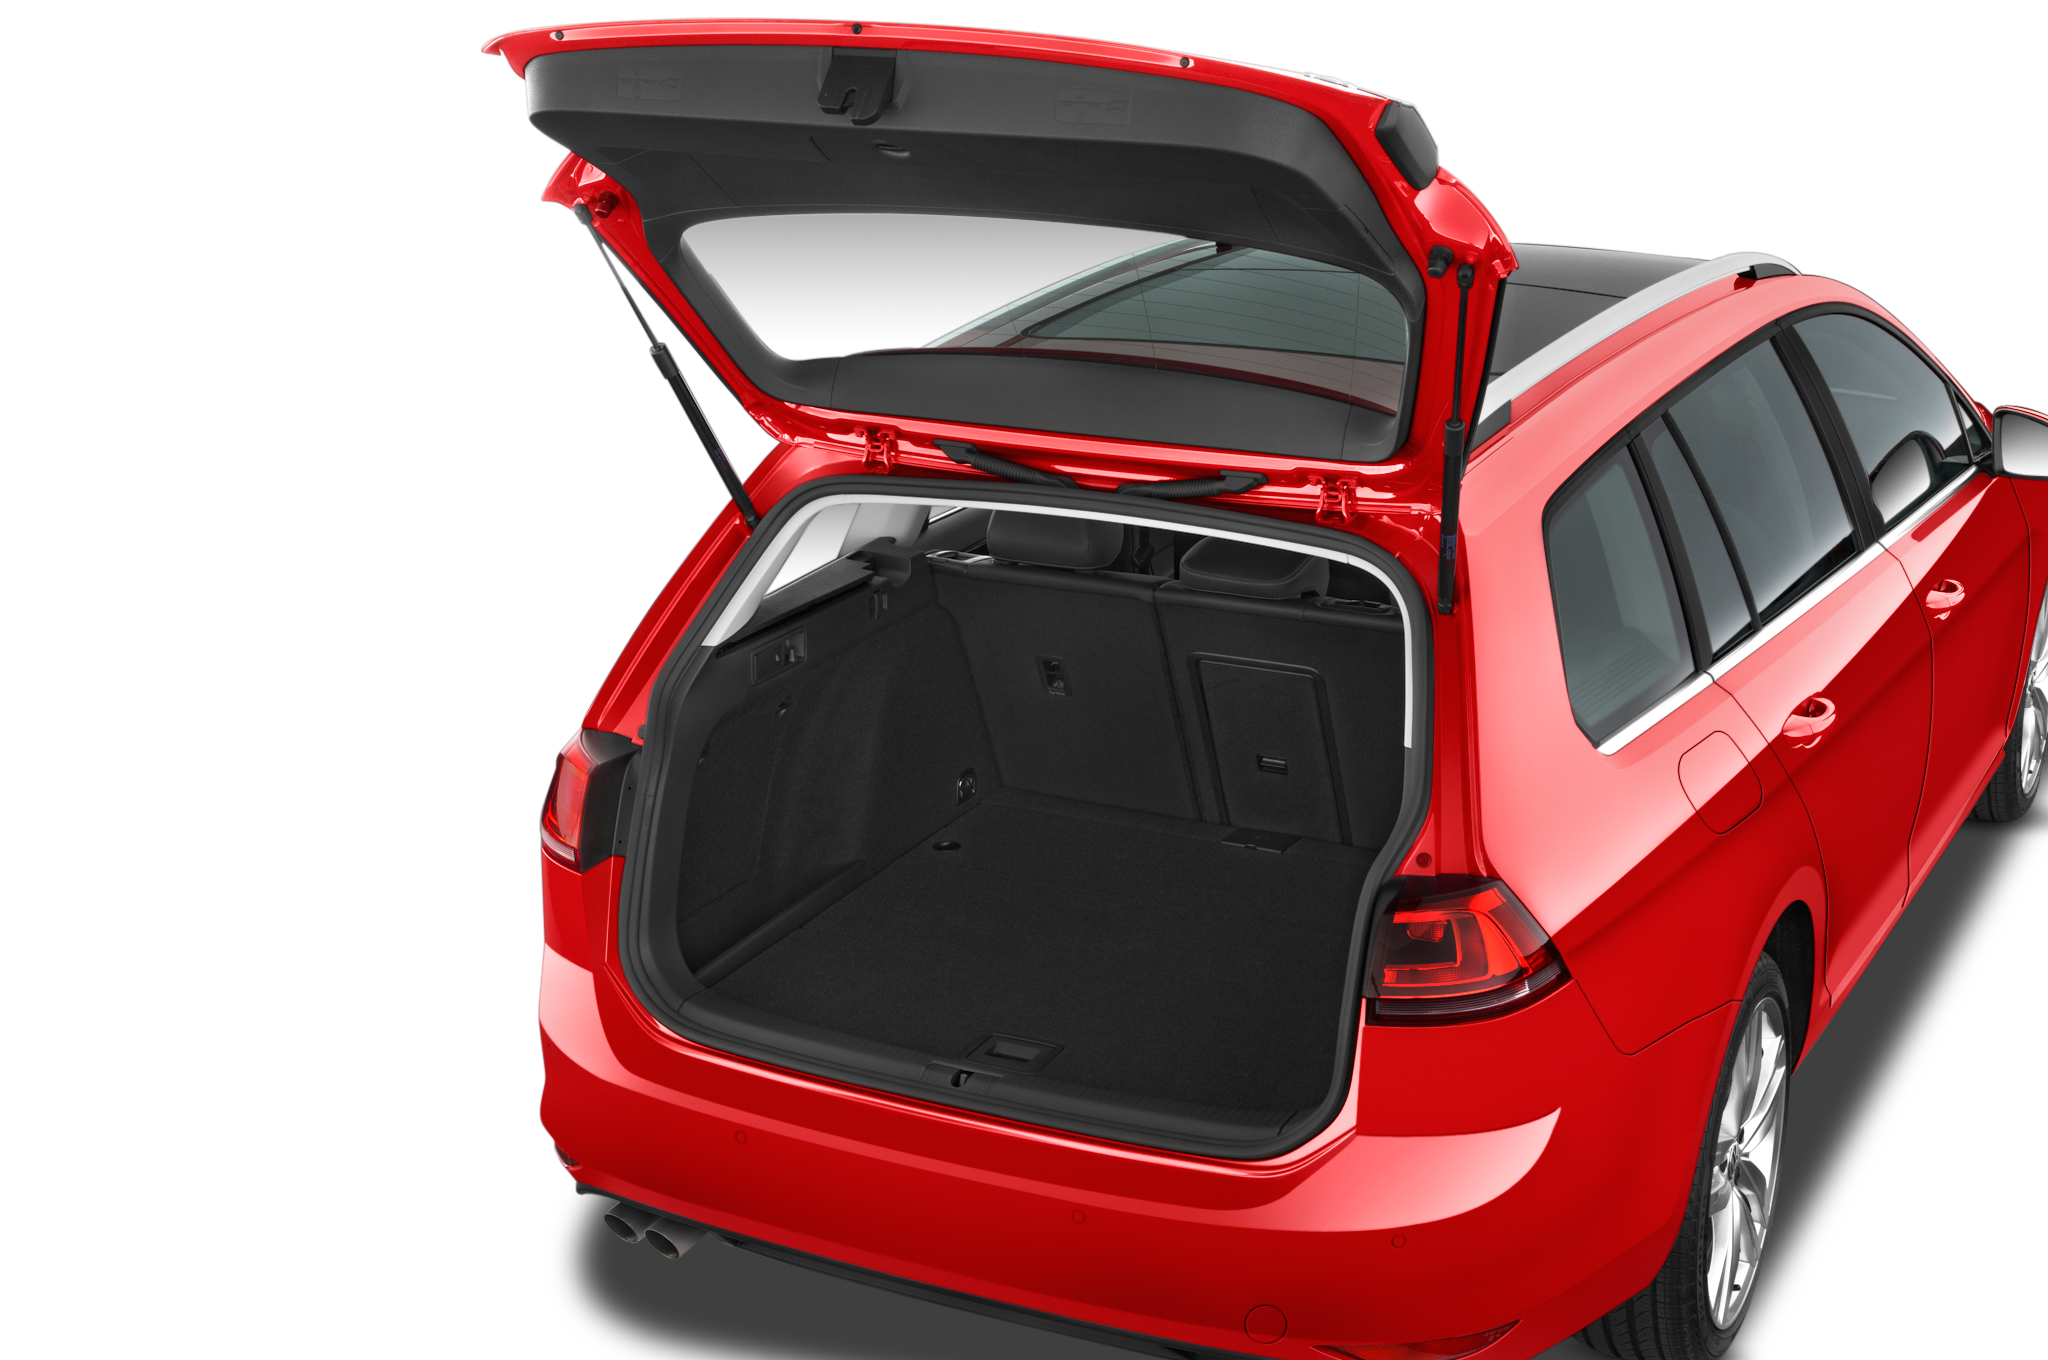 2017 Volkswagen Golf Alltrack Tsi Sel >> Oettinger Spices Up Volkswagen GTD, GTI, and Golf R | Automobile Magazine